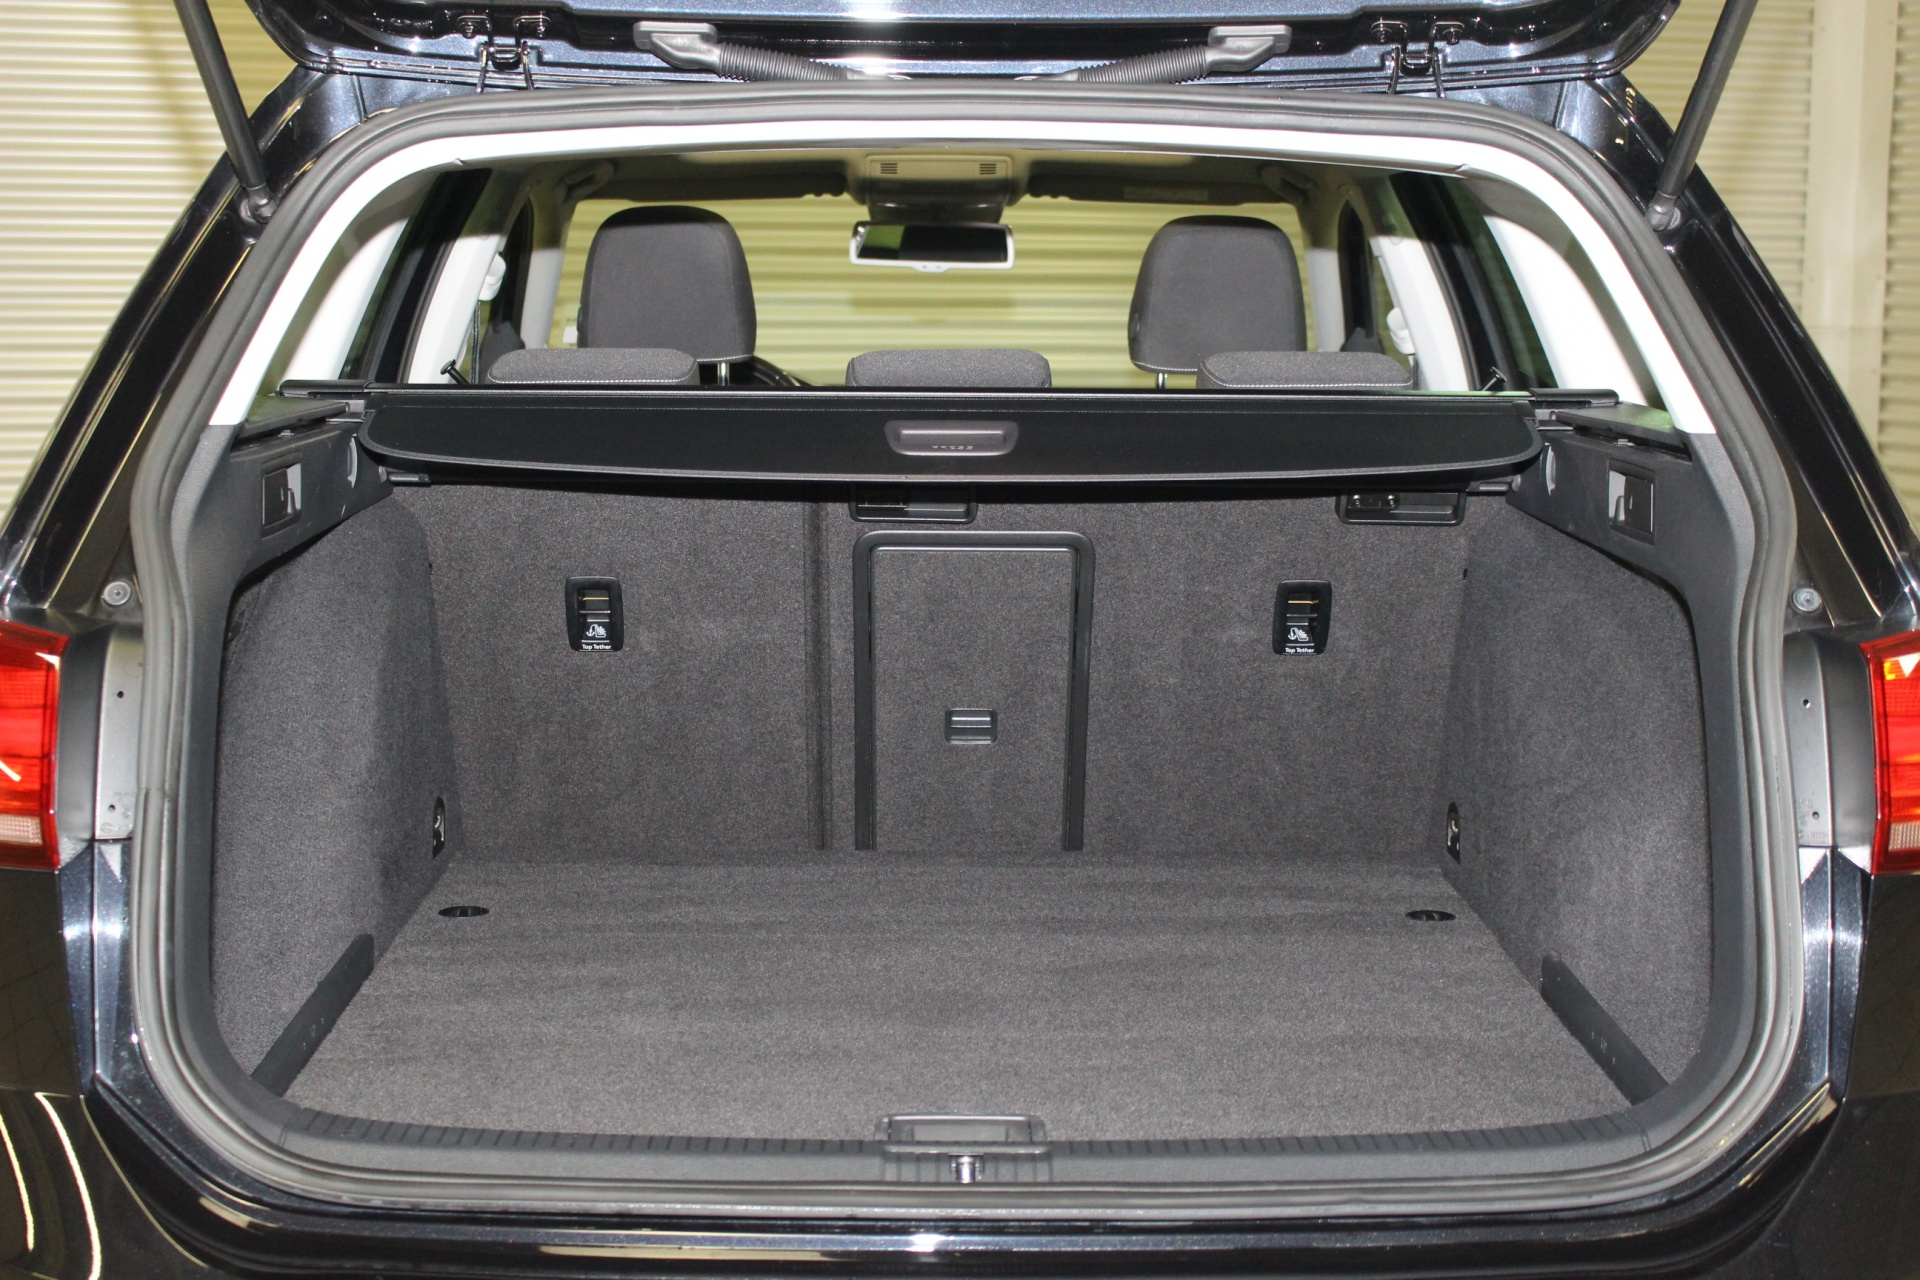 alle fahrzeuge autos kauft man bei koch gute preise guter service. Black Bedroom Furniture Sets. Home Design Ideas